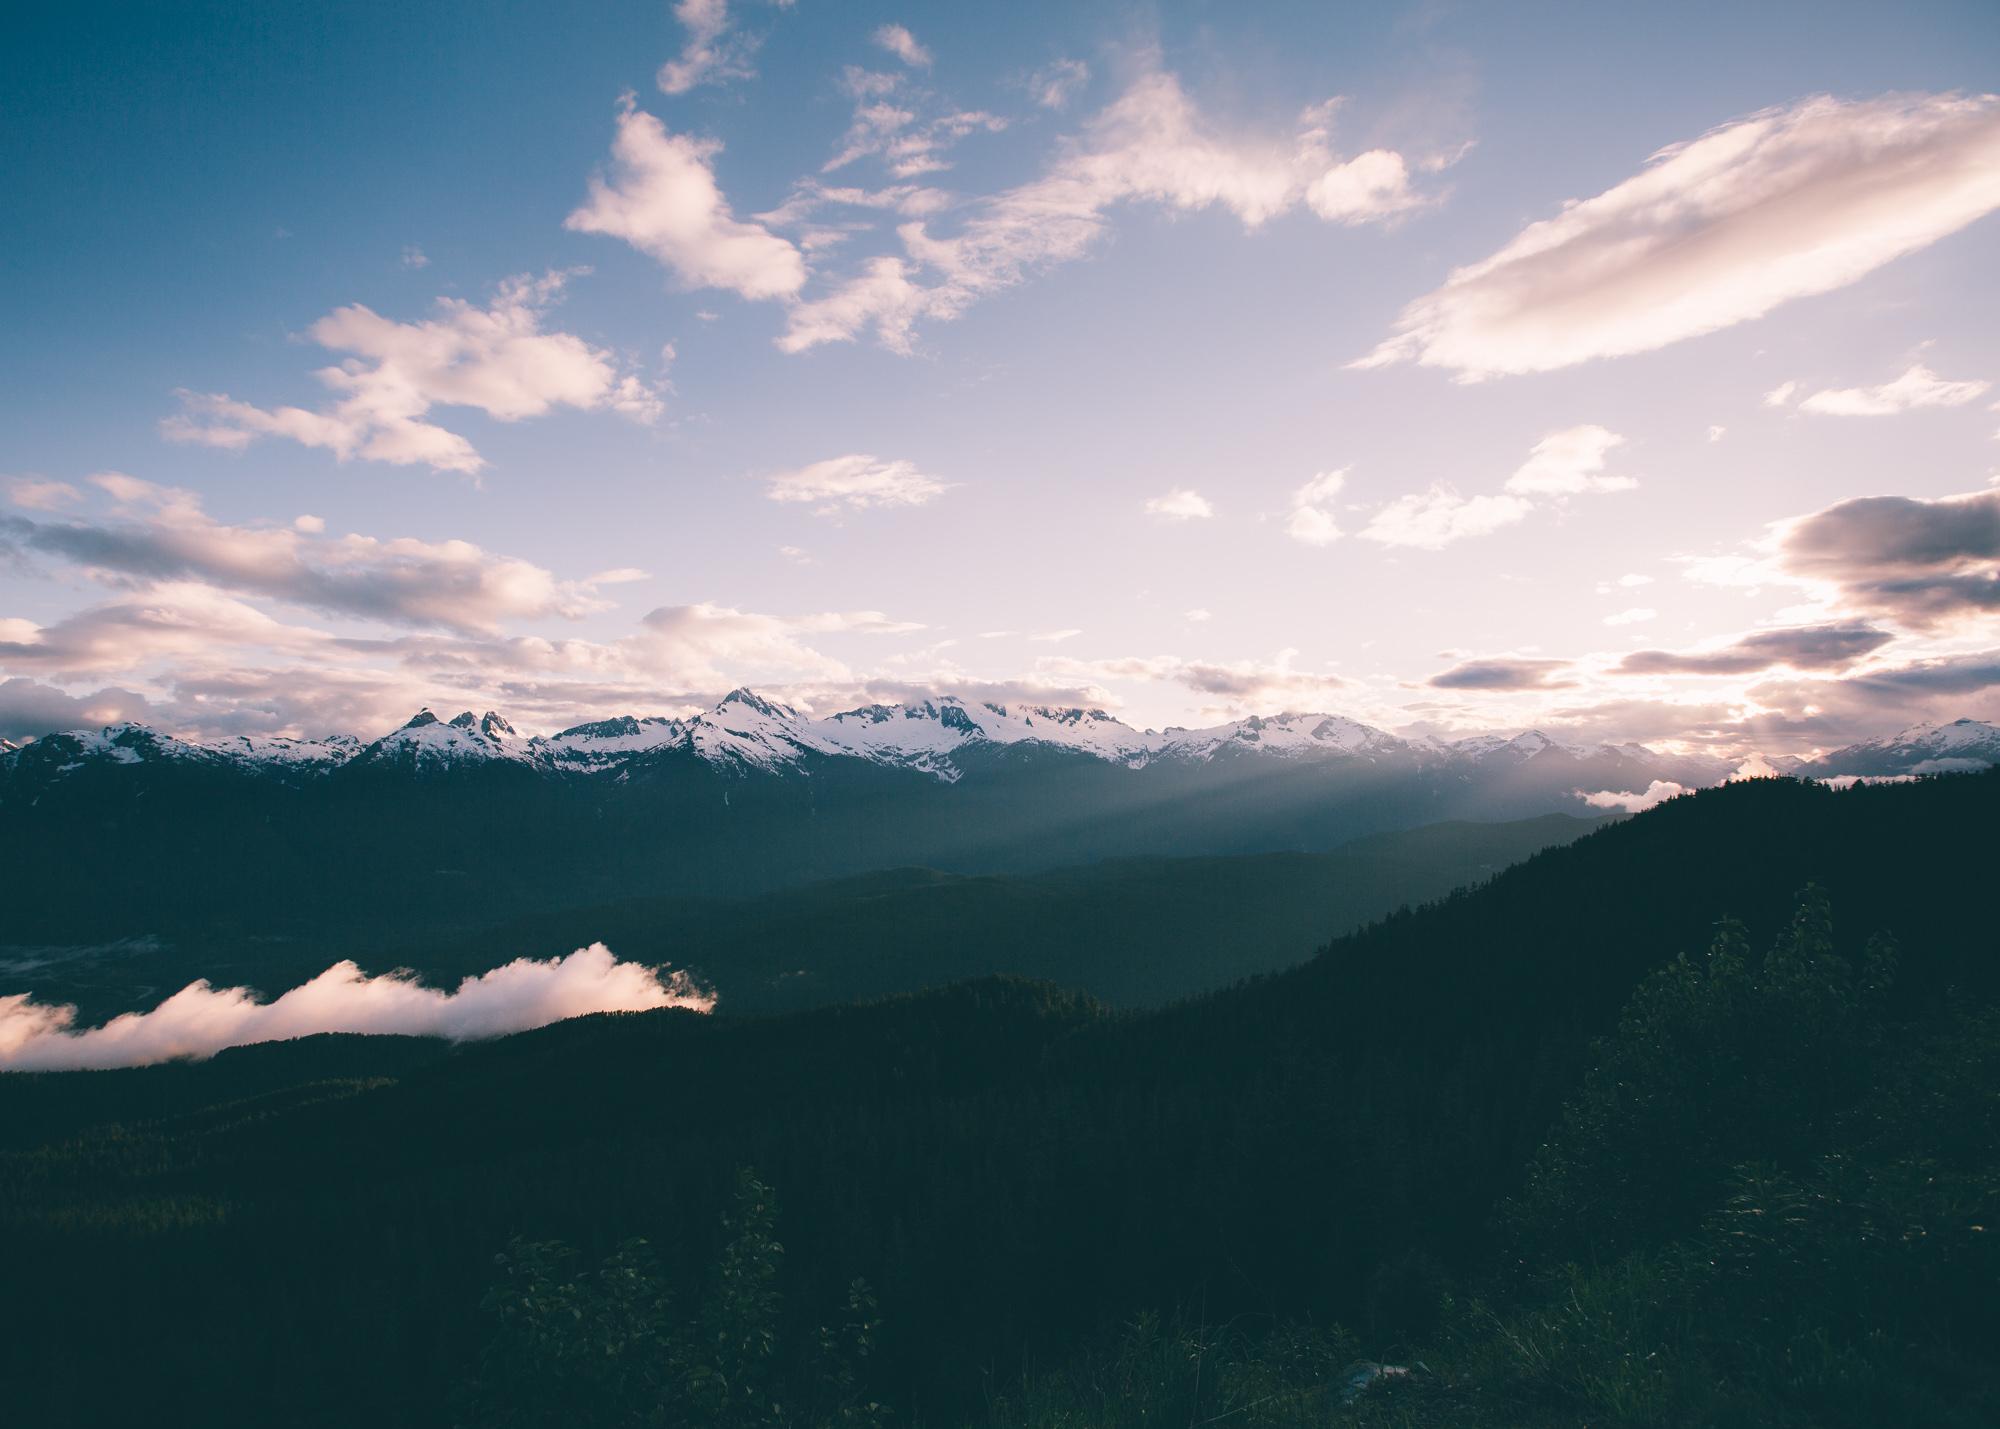 061817-Squamish-103.jpg